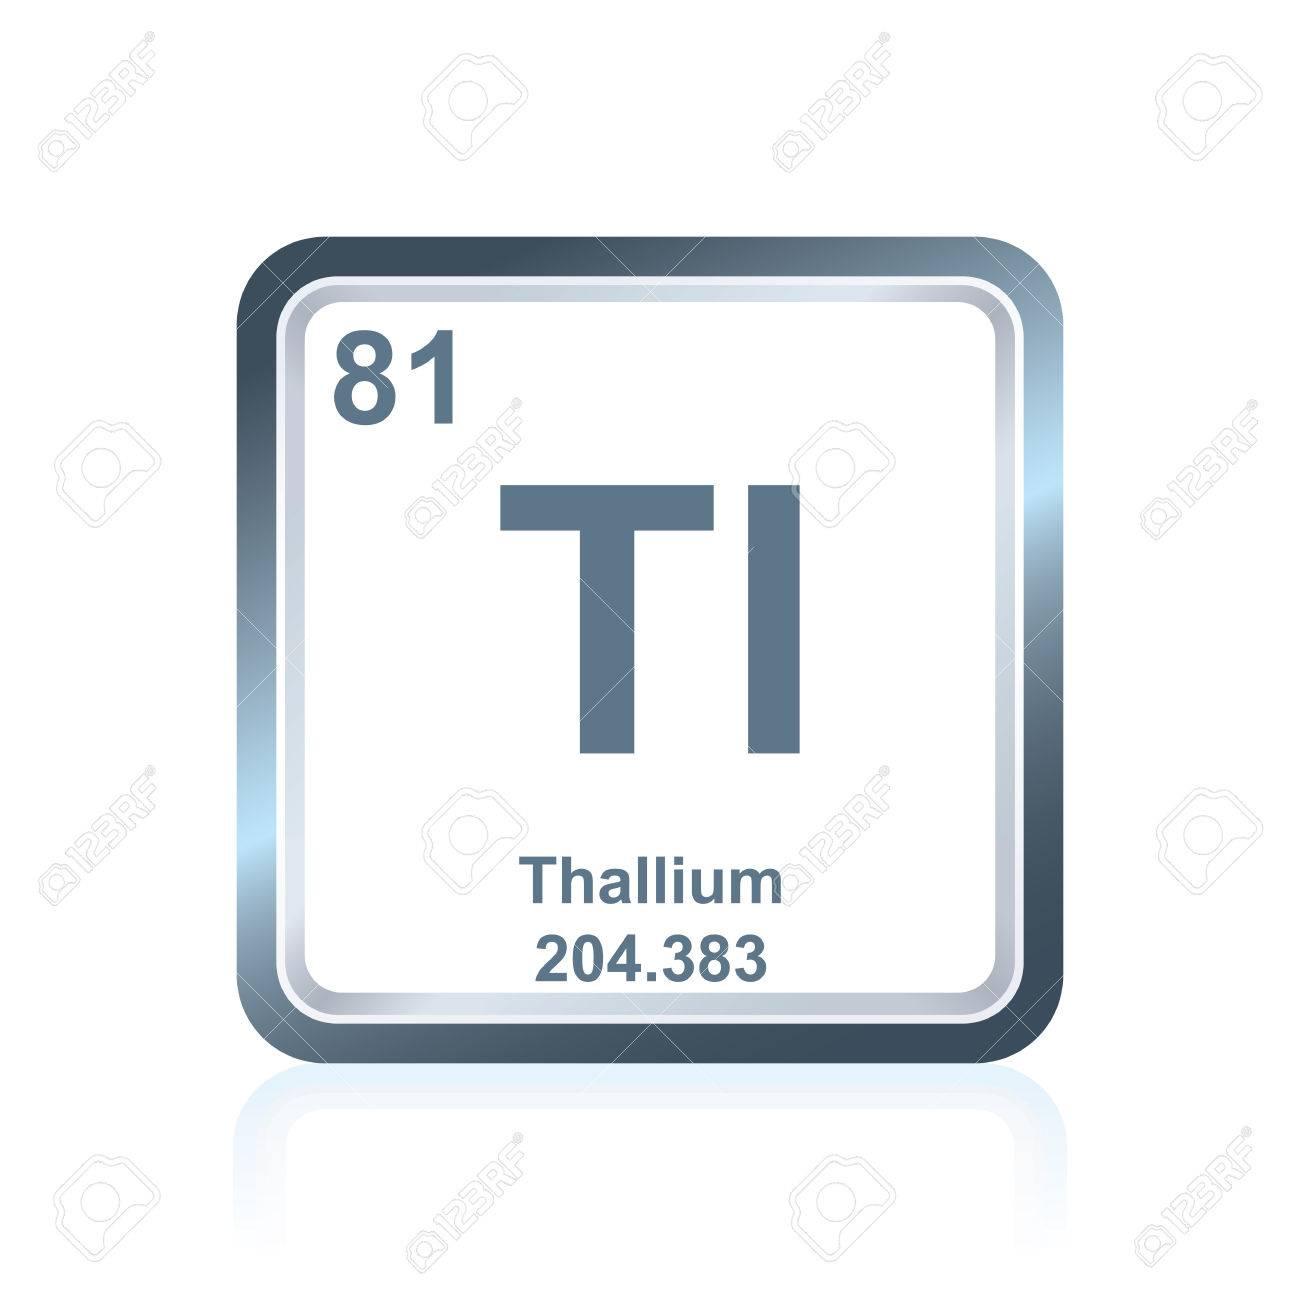 Symbol of chemical element thallium as seen on the periodic table symbol of chemical element thallium as seen on the periodic table of the elements including urtaz Choice Image